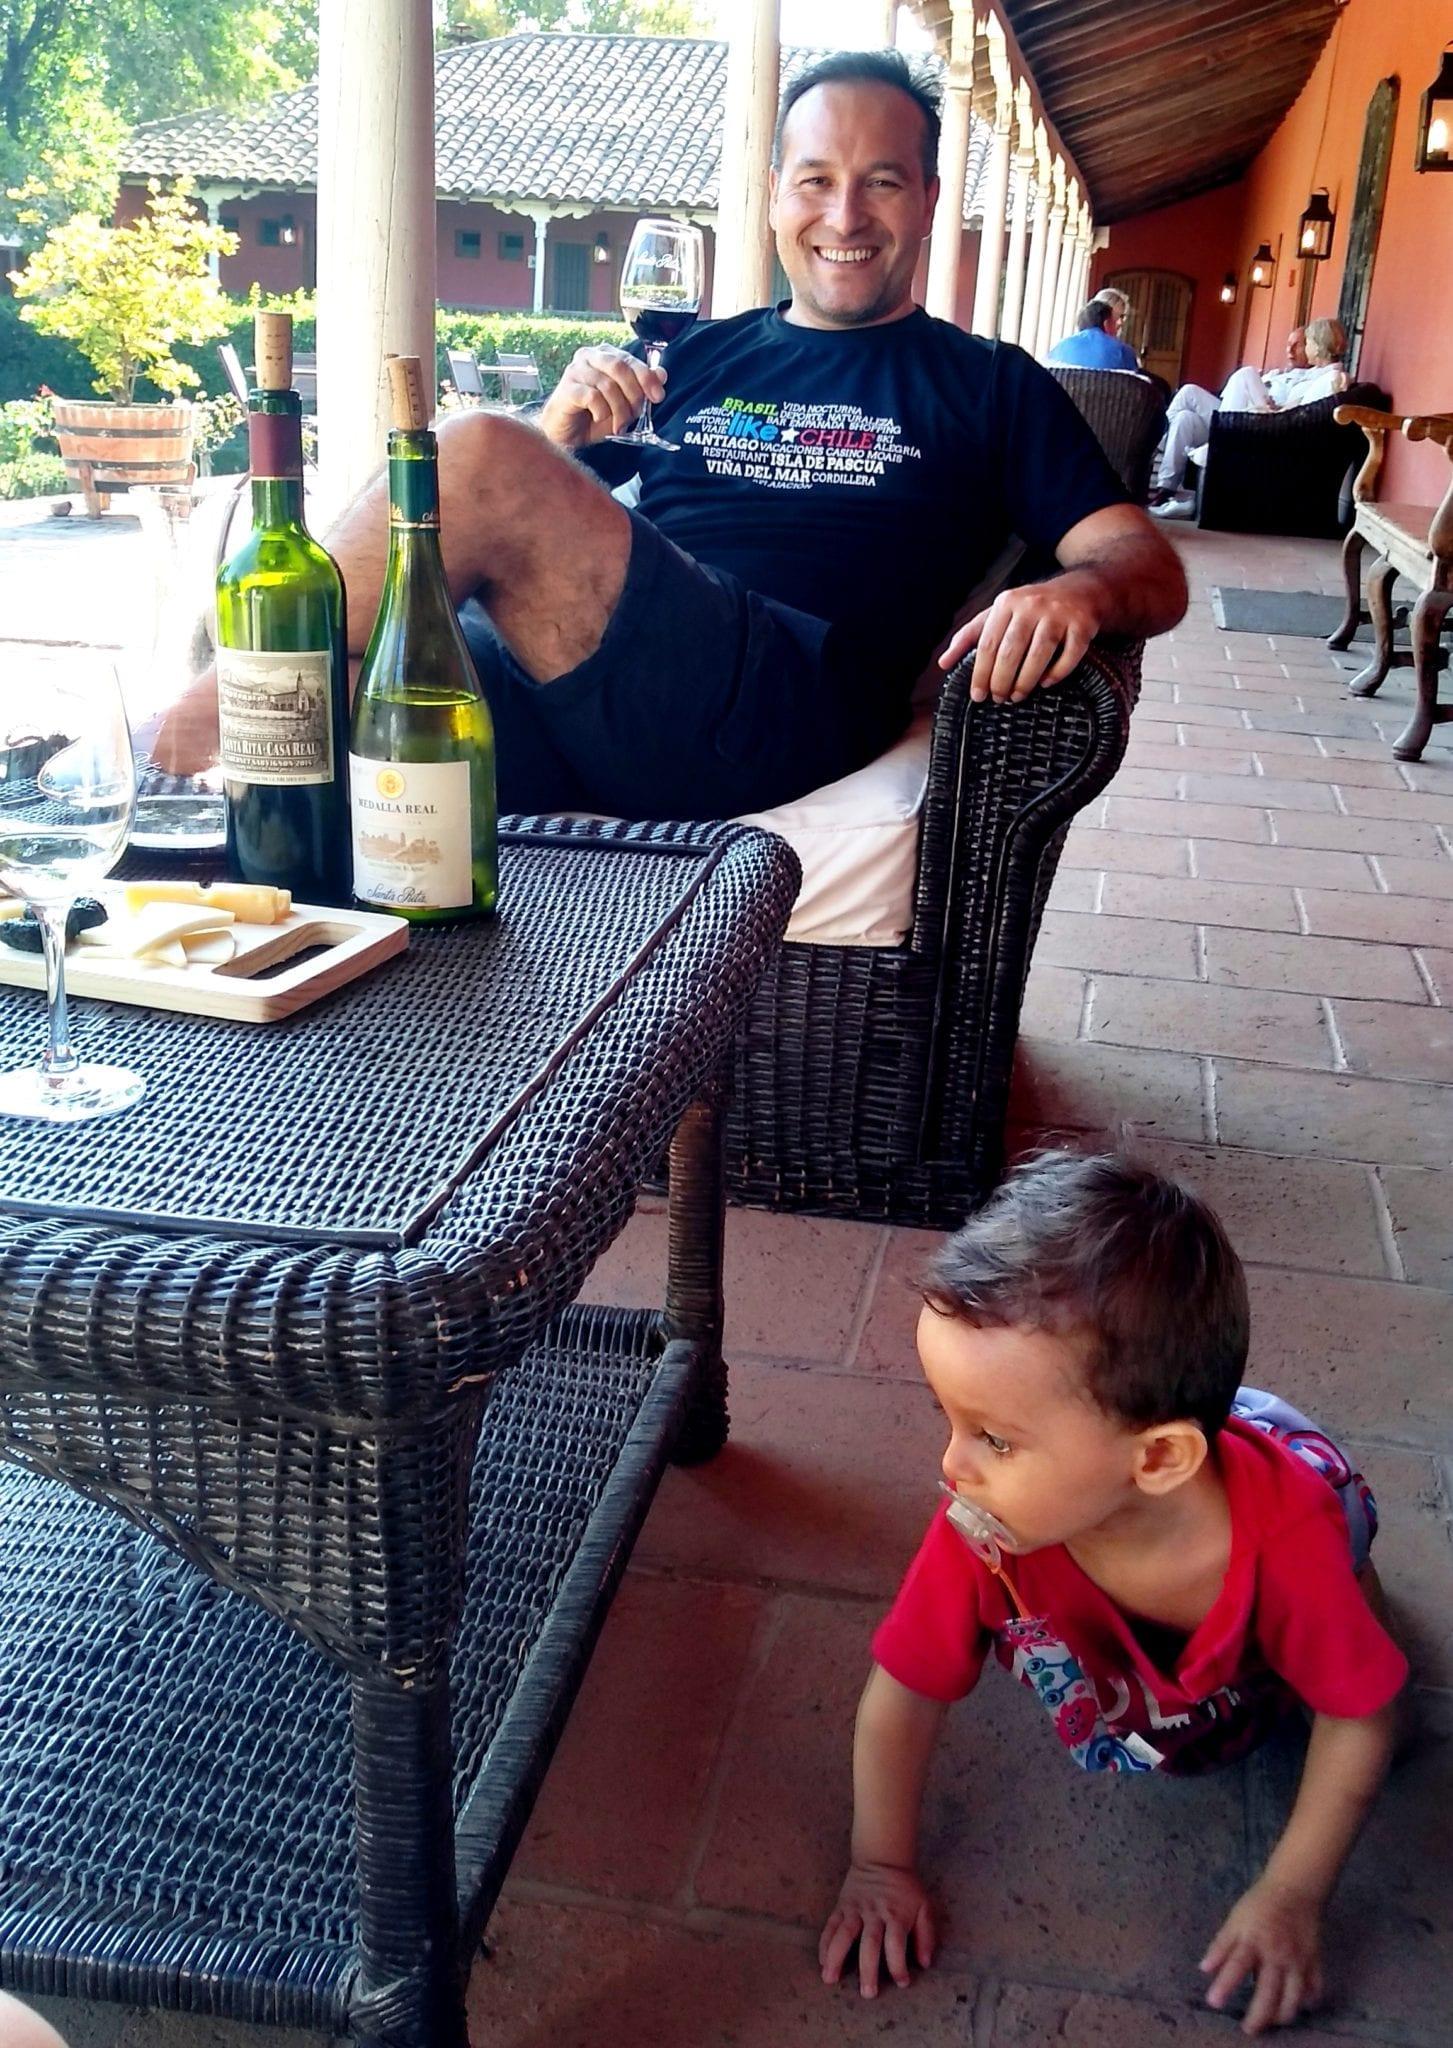 vinicola com criança pode, likechile